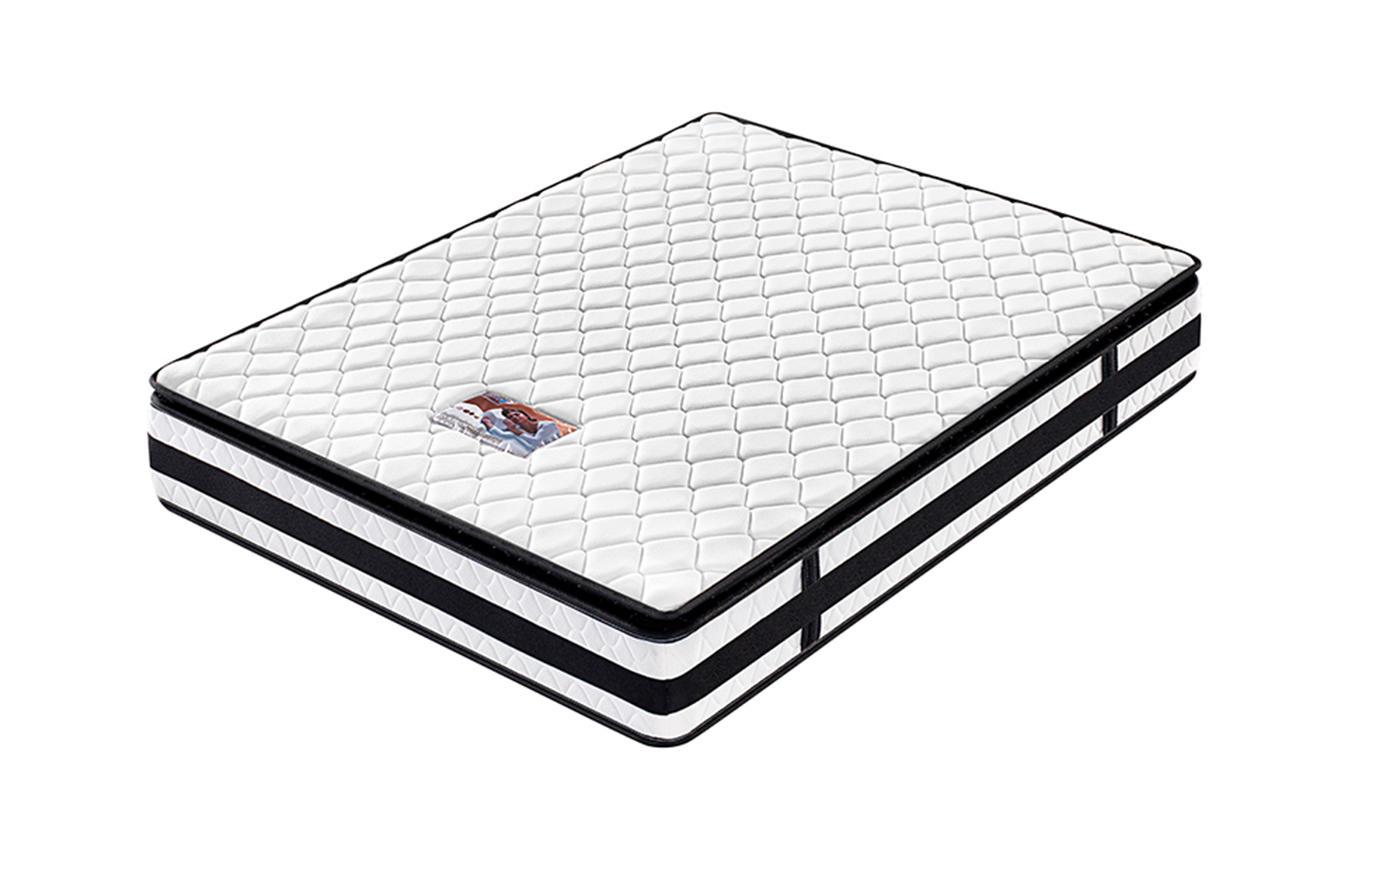 Synwin on-sale bonnell mattress helpful for star hotel-1